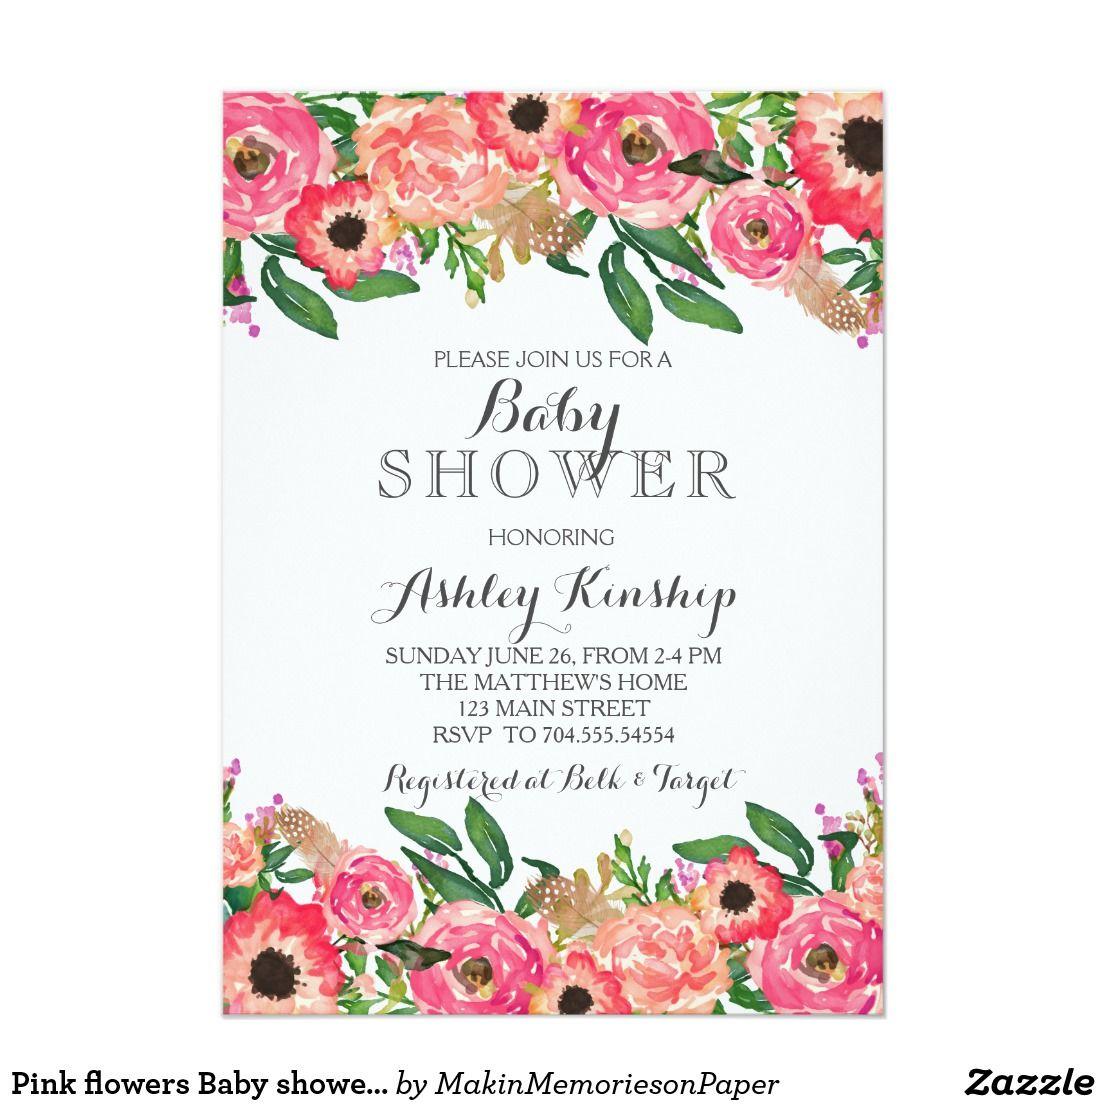 Pink flowers baby shower invitation baby shower invitationsbirth pink flowers baby shower invitation filmwisefo